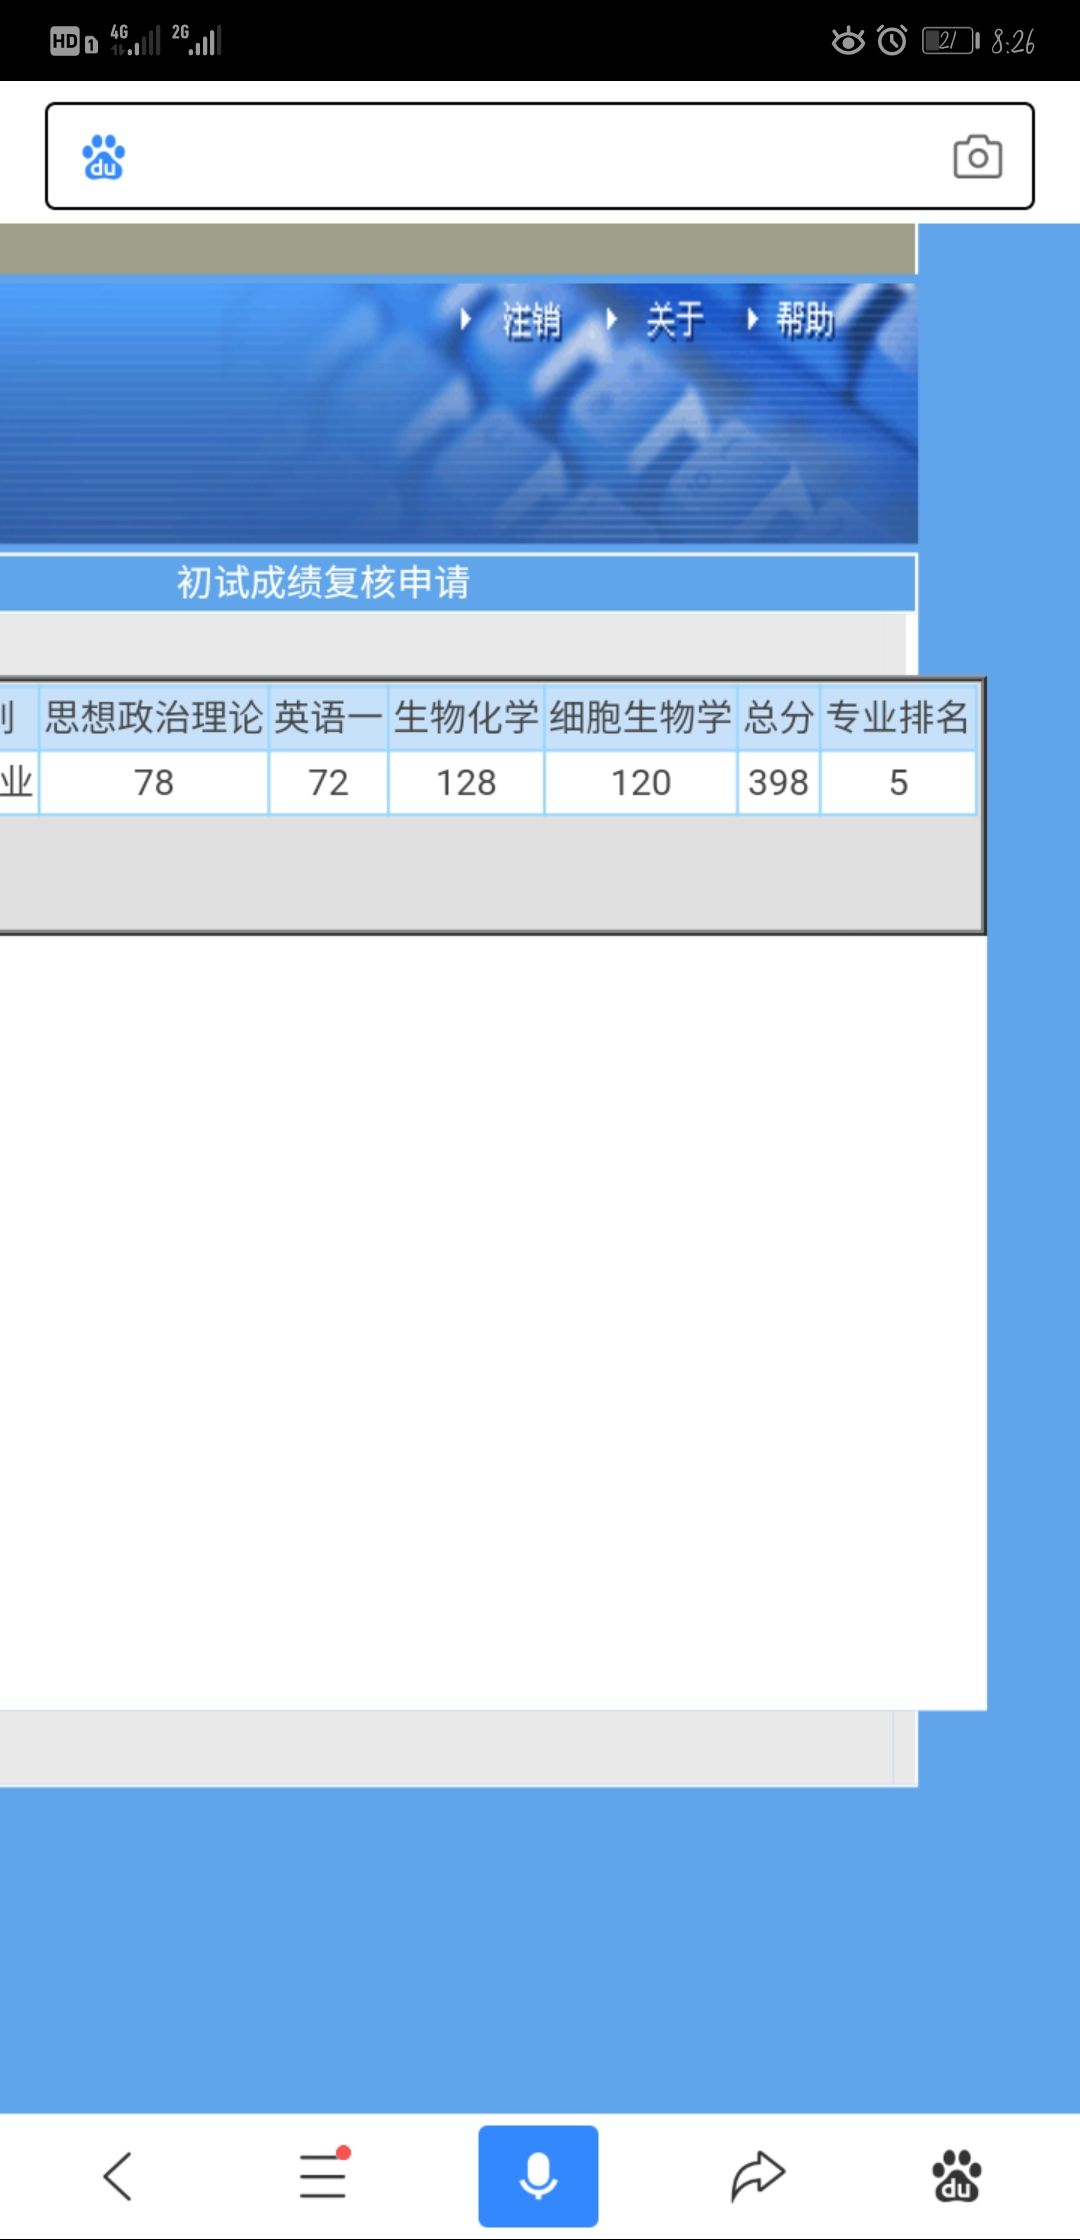 IMG_BEF8C5CCAA885A6E2AEDED2F32F41C.jpeg